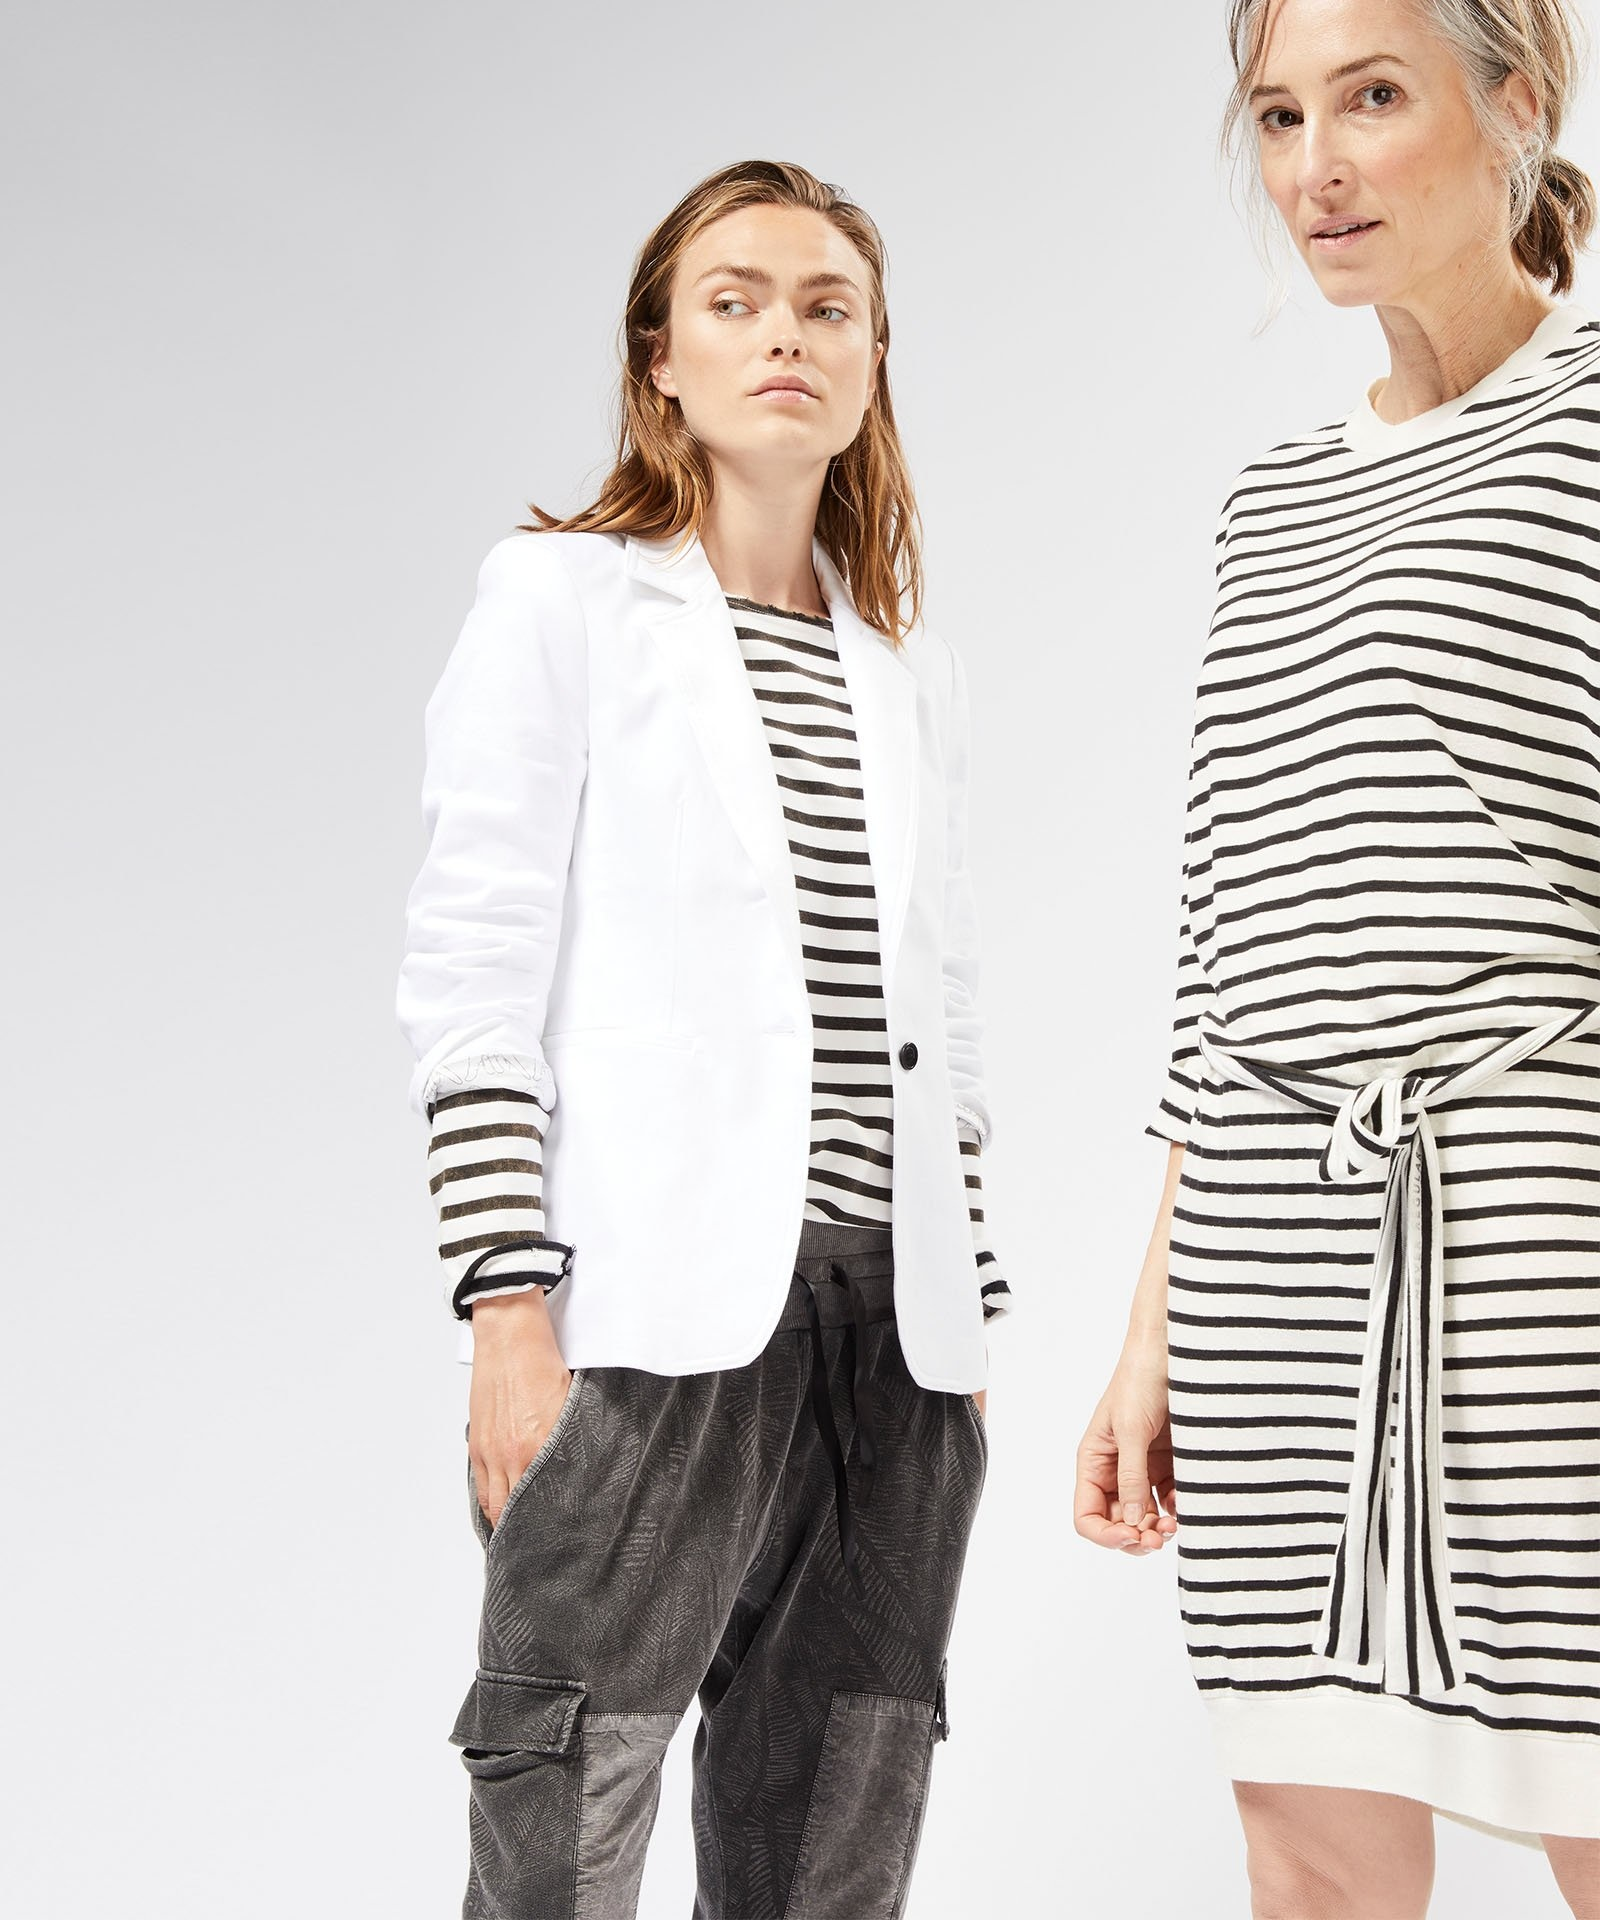 Jurk belted stripes Ecru Black-2